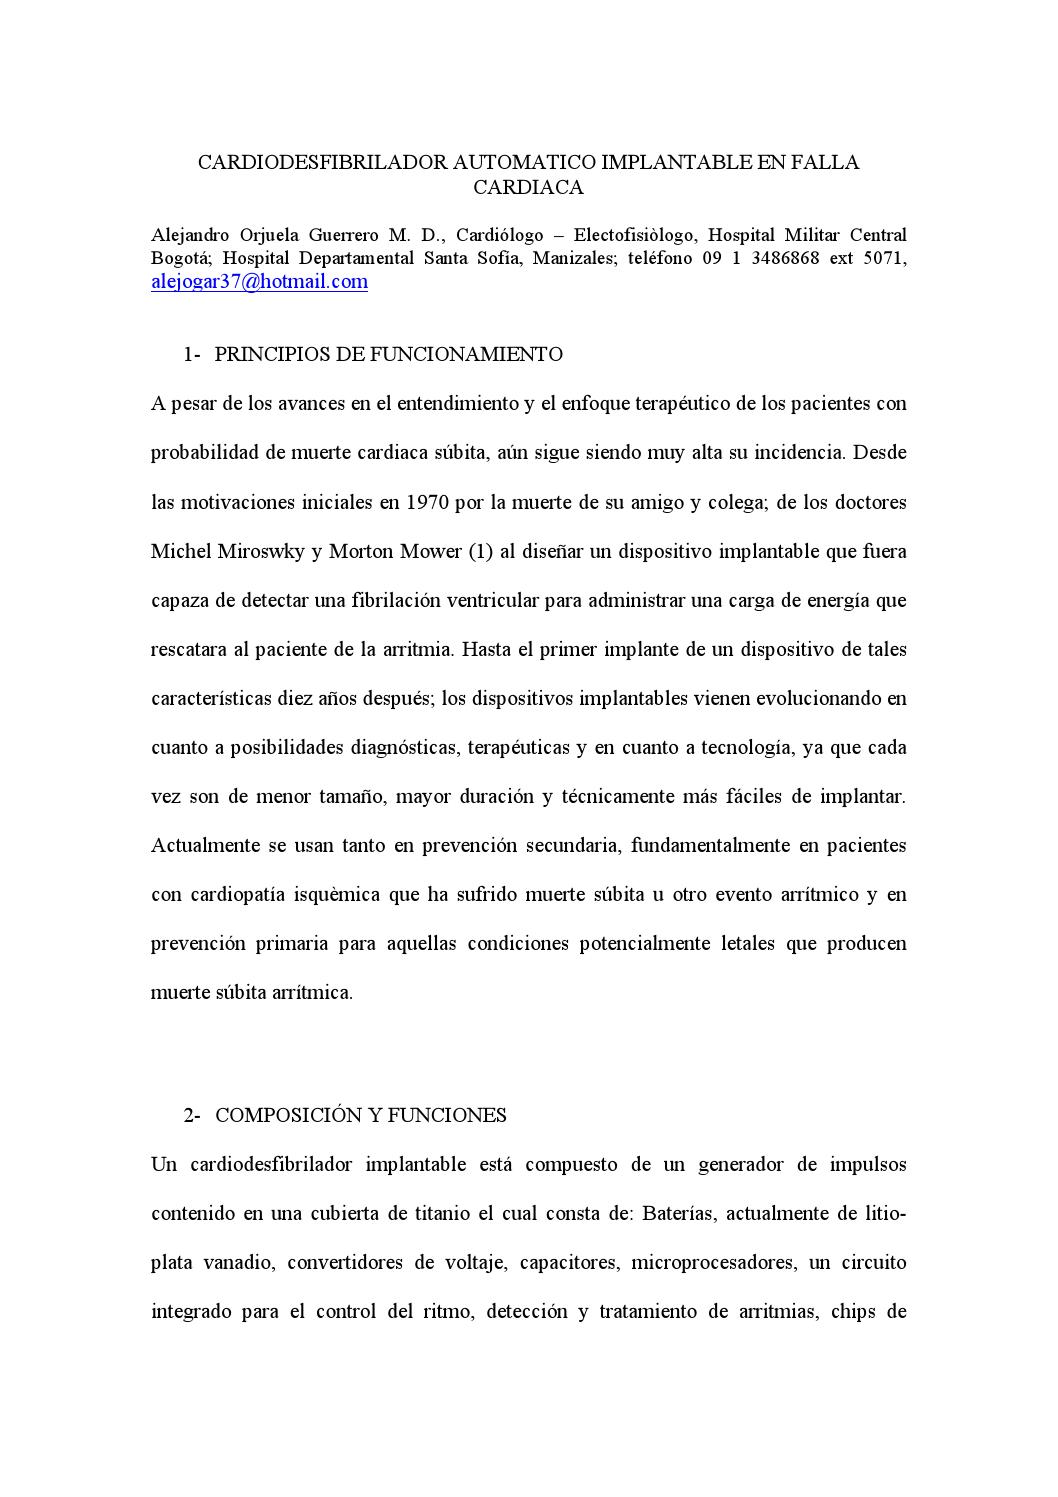 CARDIODESFIBRILADOR AUTOMATICO IMPLANTABLE EN FALLA CARDIACA by ...